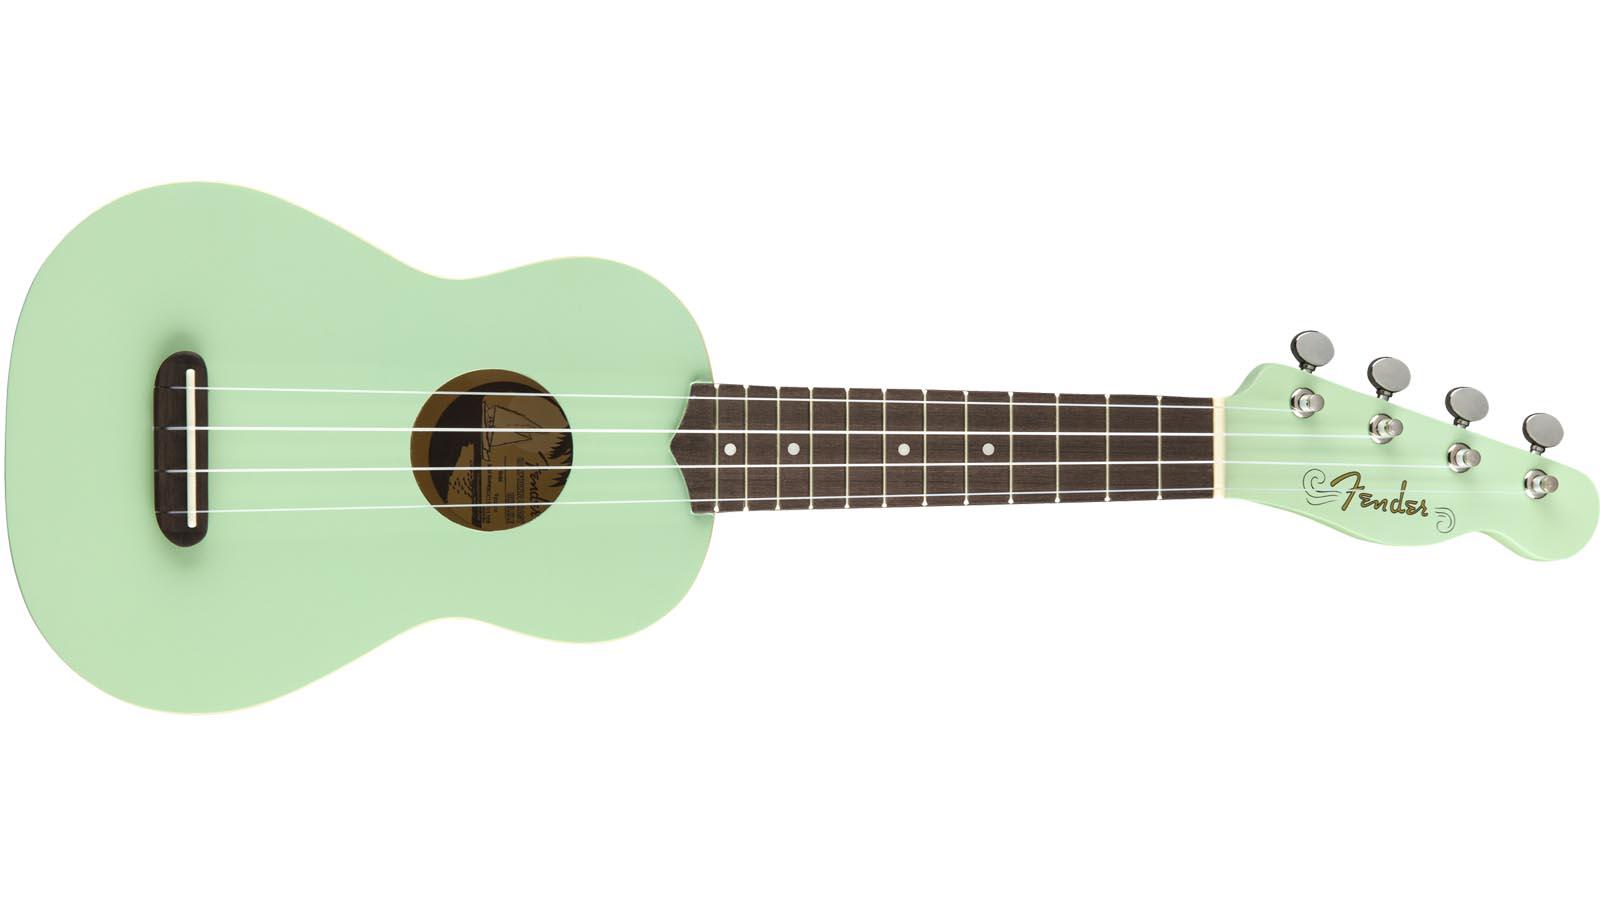 Fender Venice Soprano Ukulele SG Surf Green